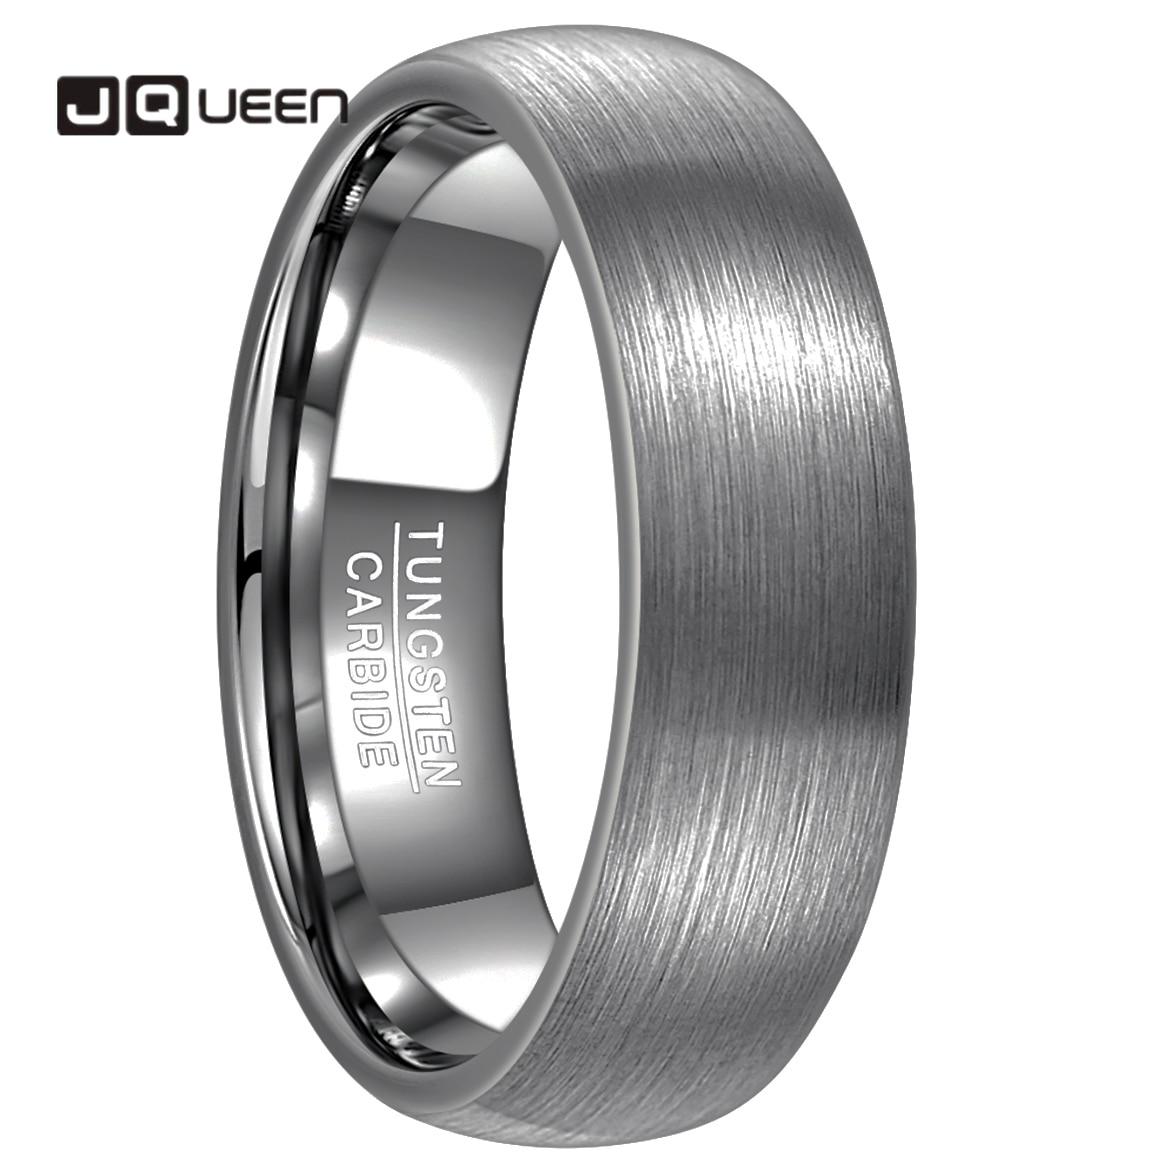 JQUEEN 7mm Men Ring 100% Tungsten Carbide Ring Men's Jewelry Wedding Bands Anillos Para Hombres Pierscienie Comfort Fit